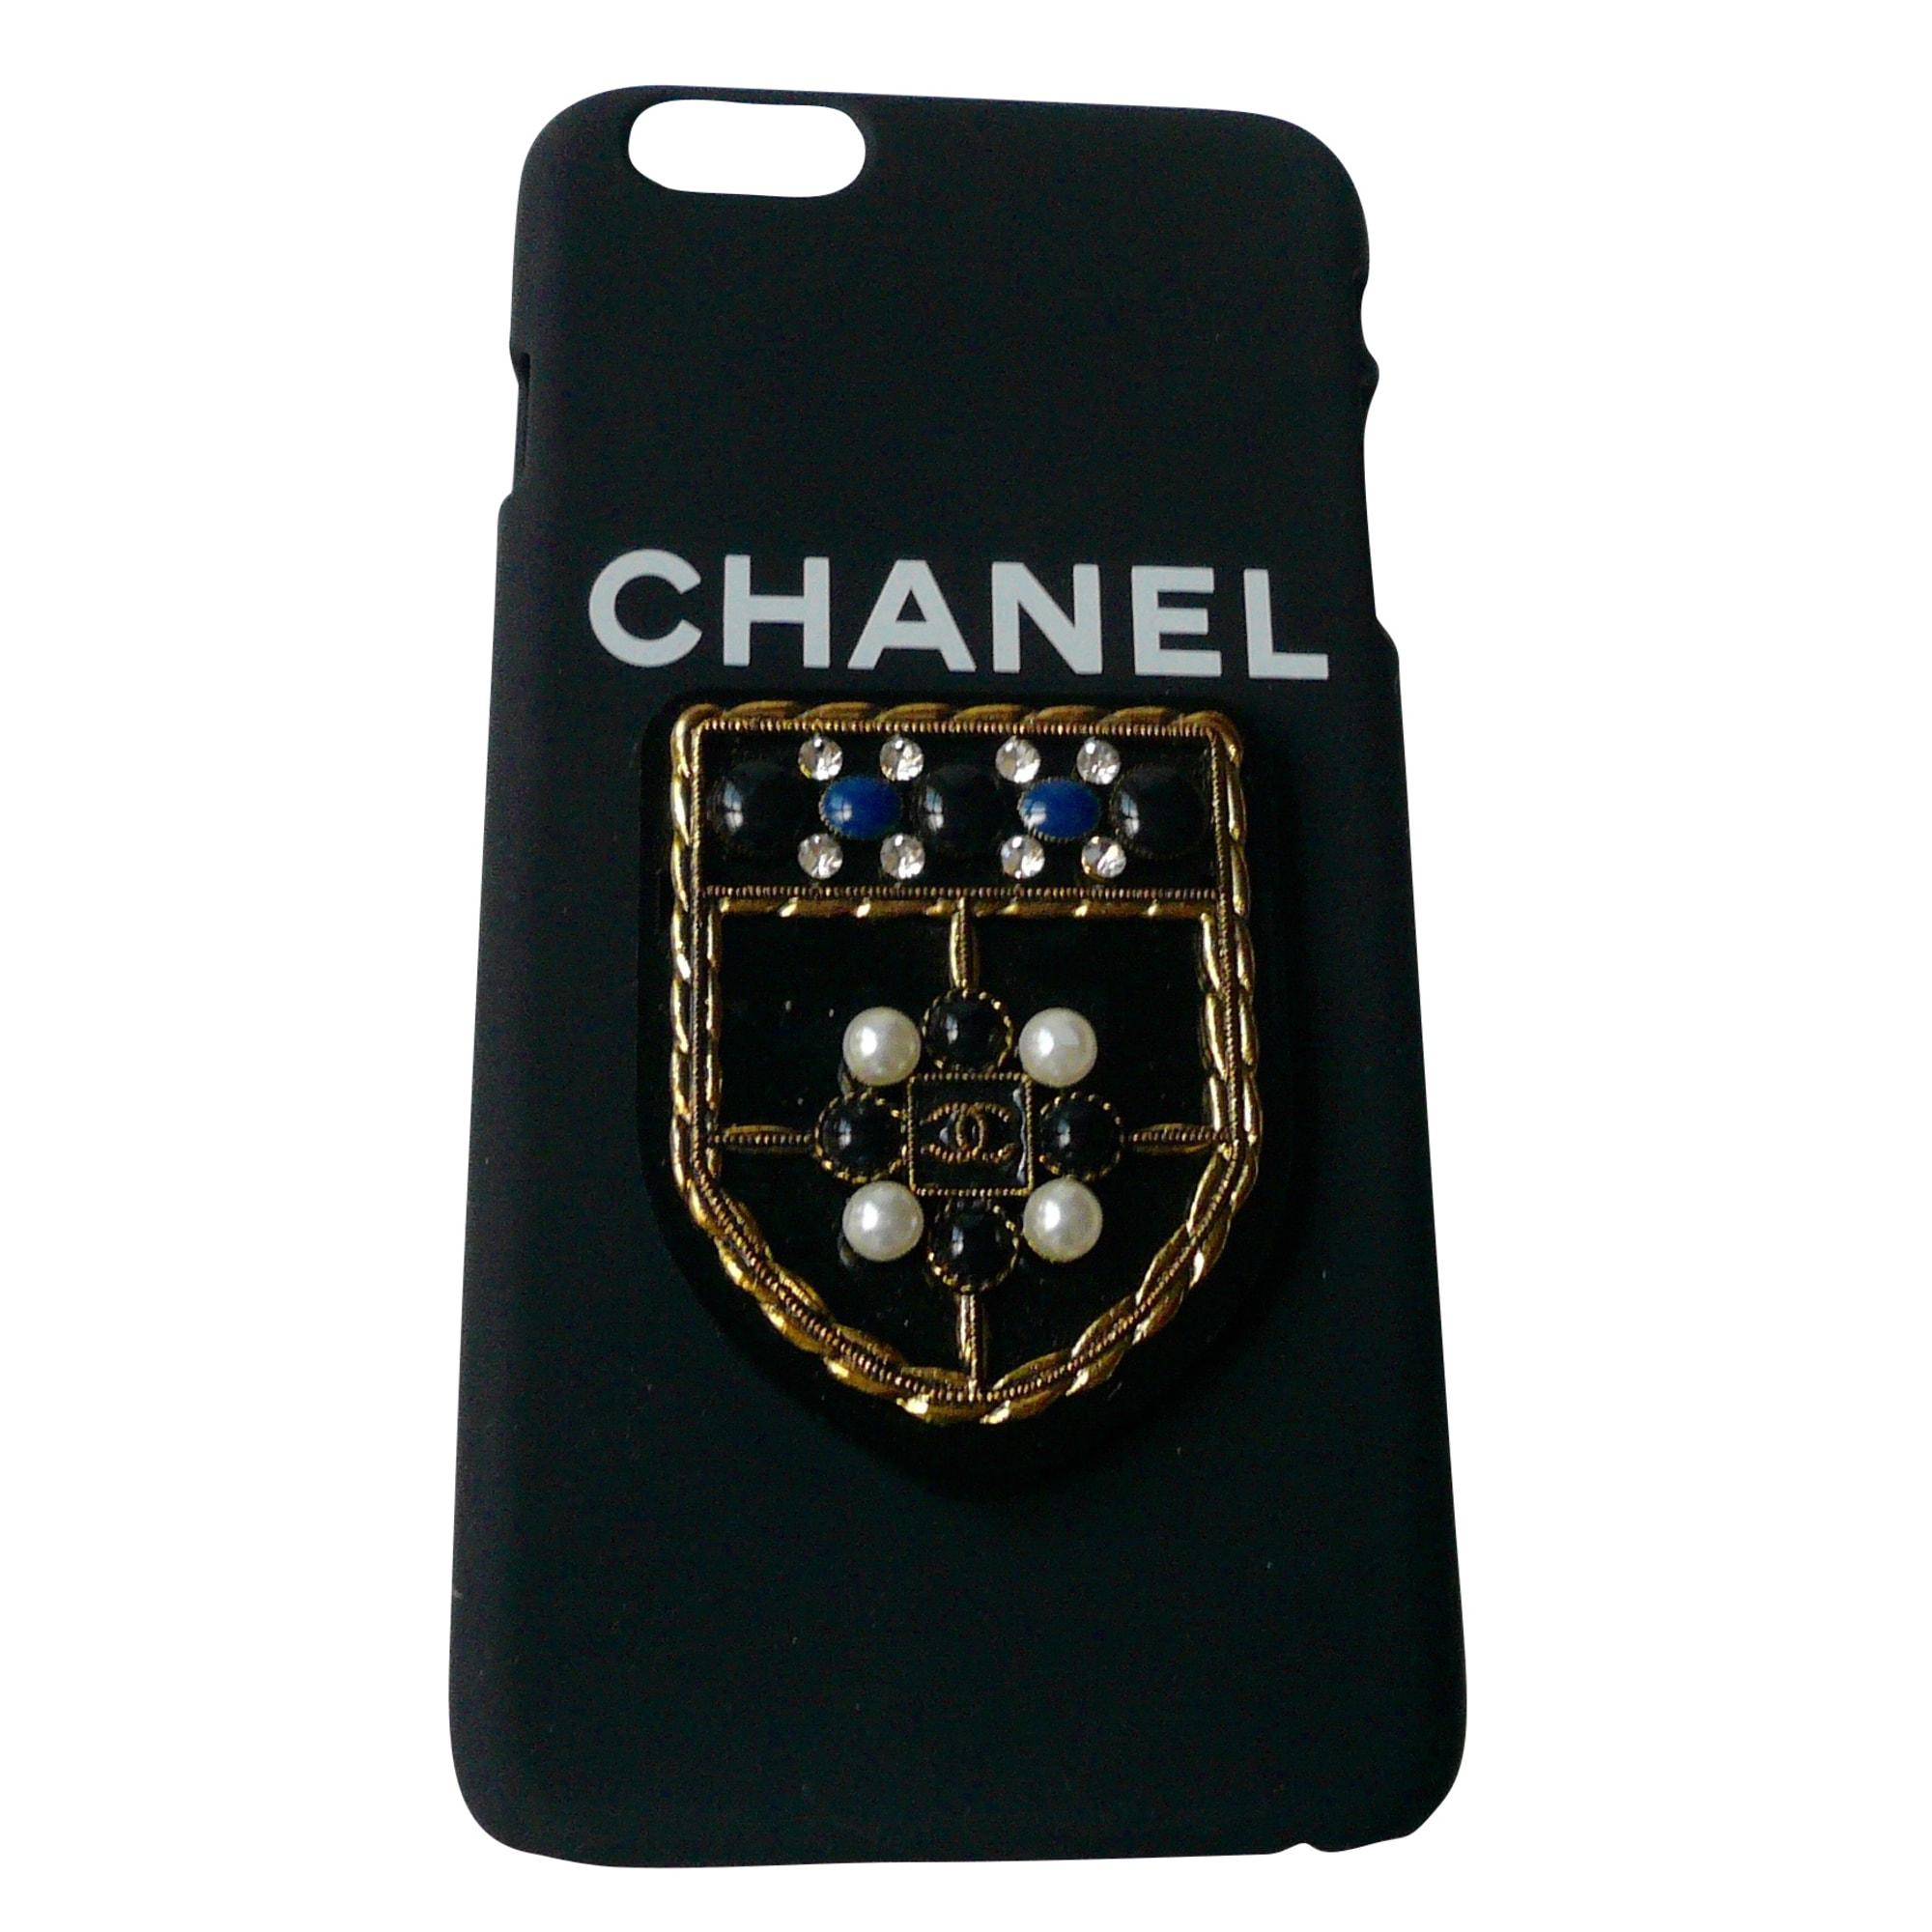 Etui iPhone  CHANEL Noir